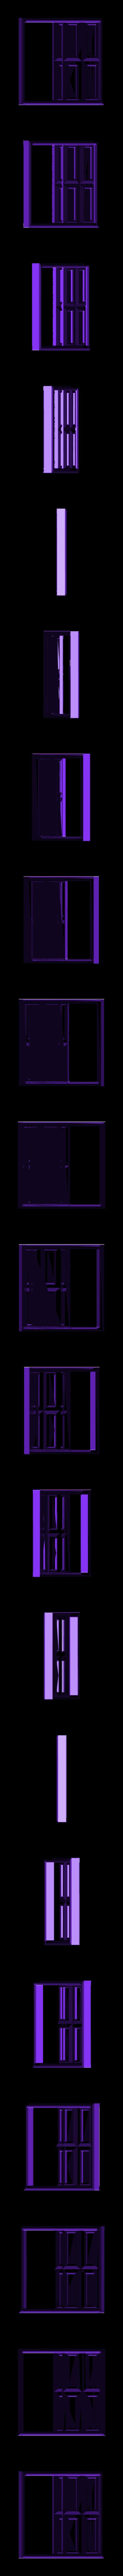 modernwindow5.stl Download free STL file Doors and windows terrain kitbash kit • 3D printing template, HeribertoValle